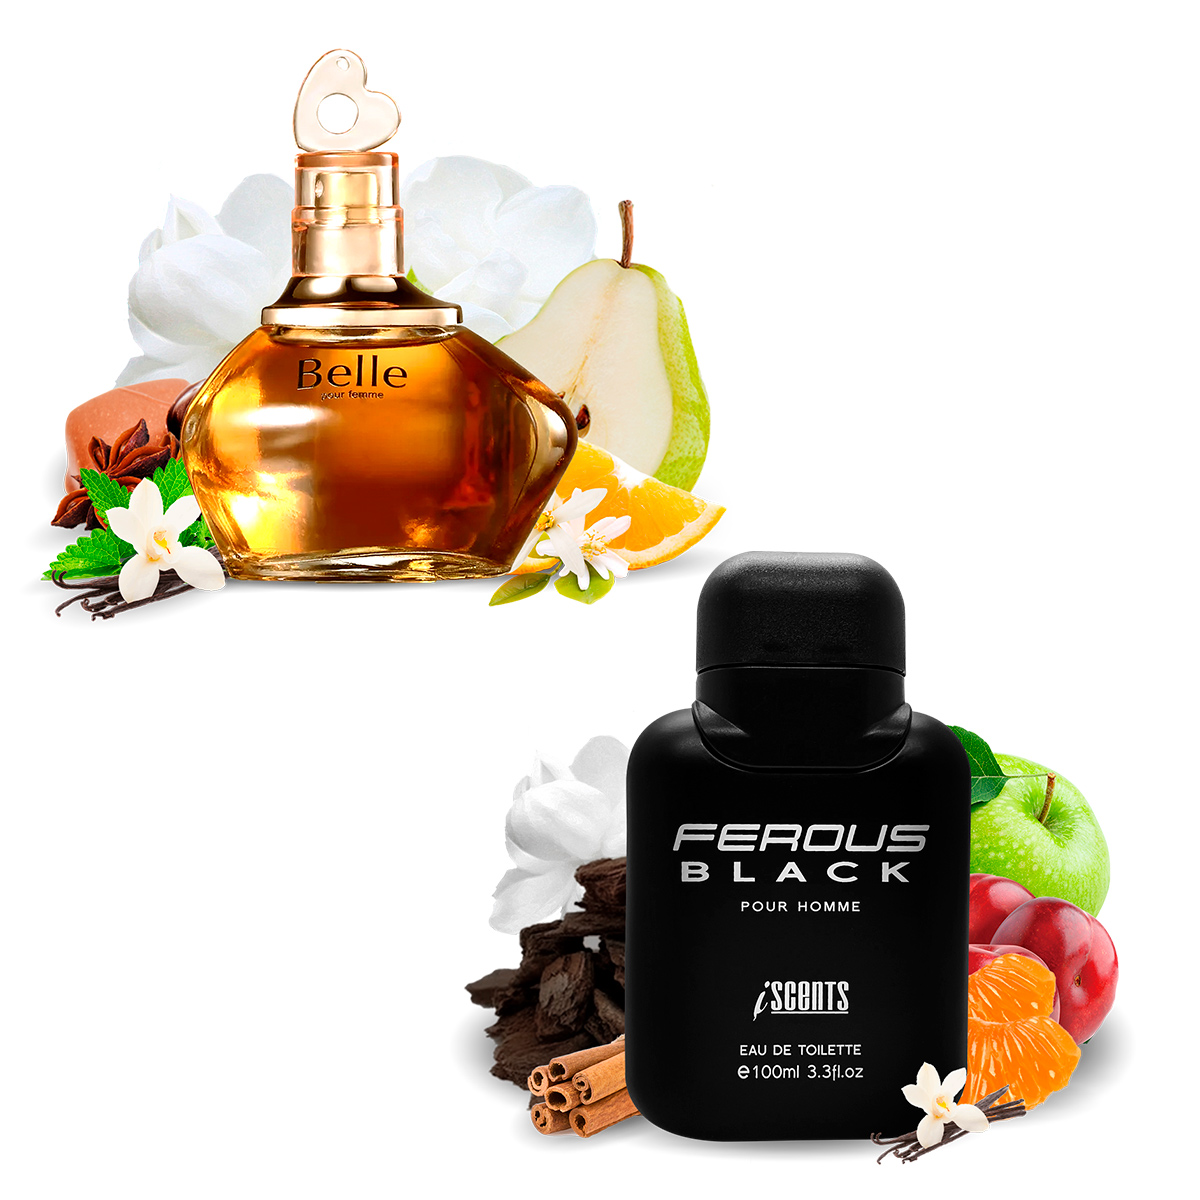 Kit 2 Perfumes Importados Belle e Ferous Black I Scents